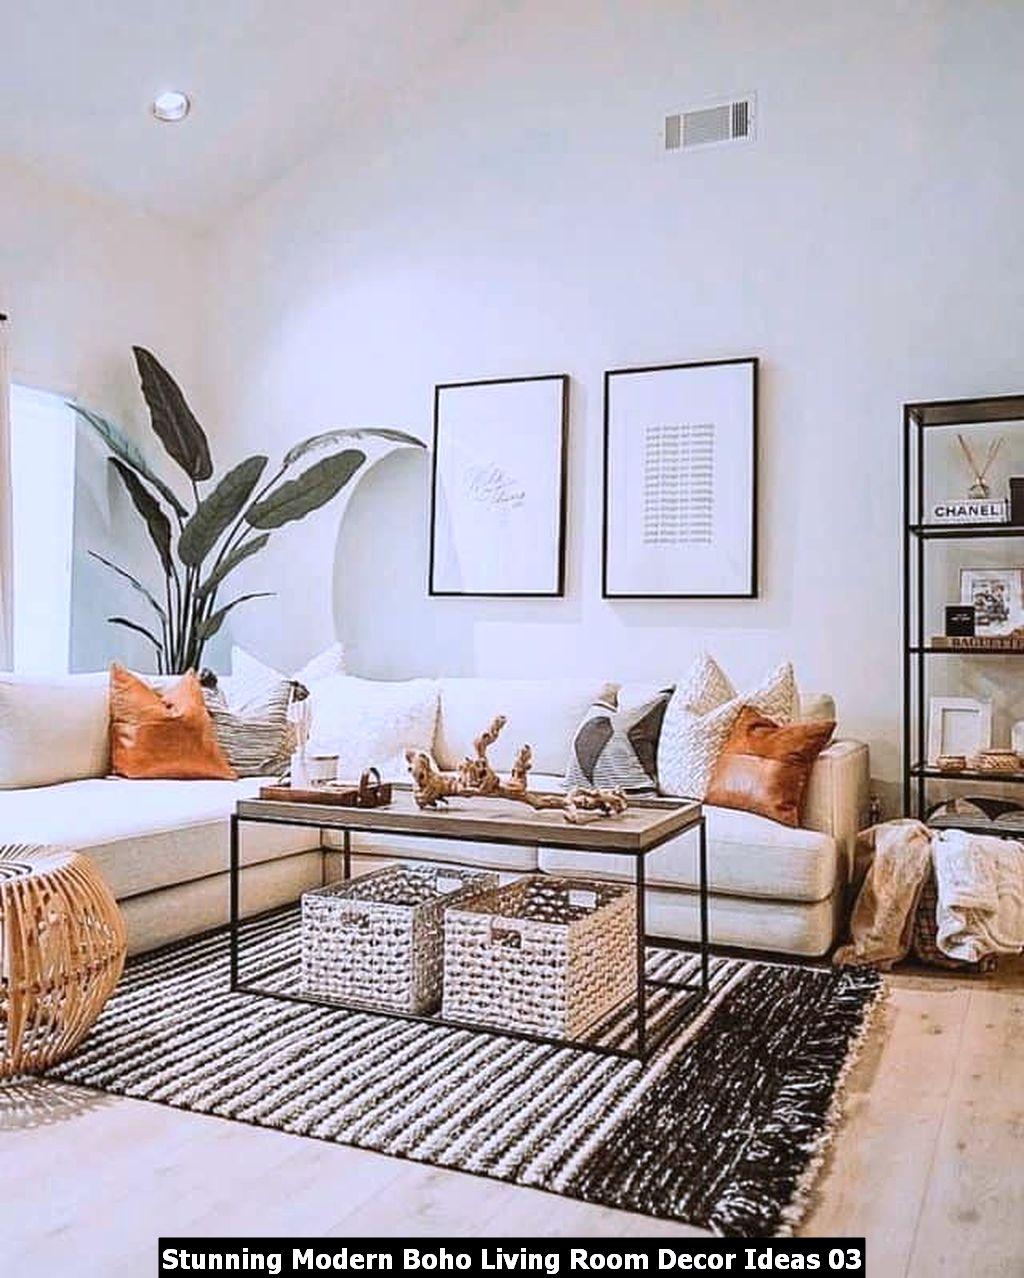 Stunning Modern Boho Living Room Decor Ideas 03